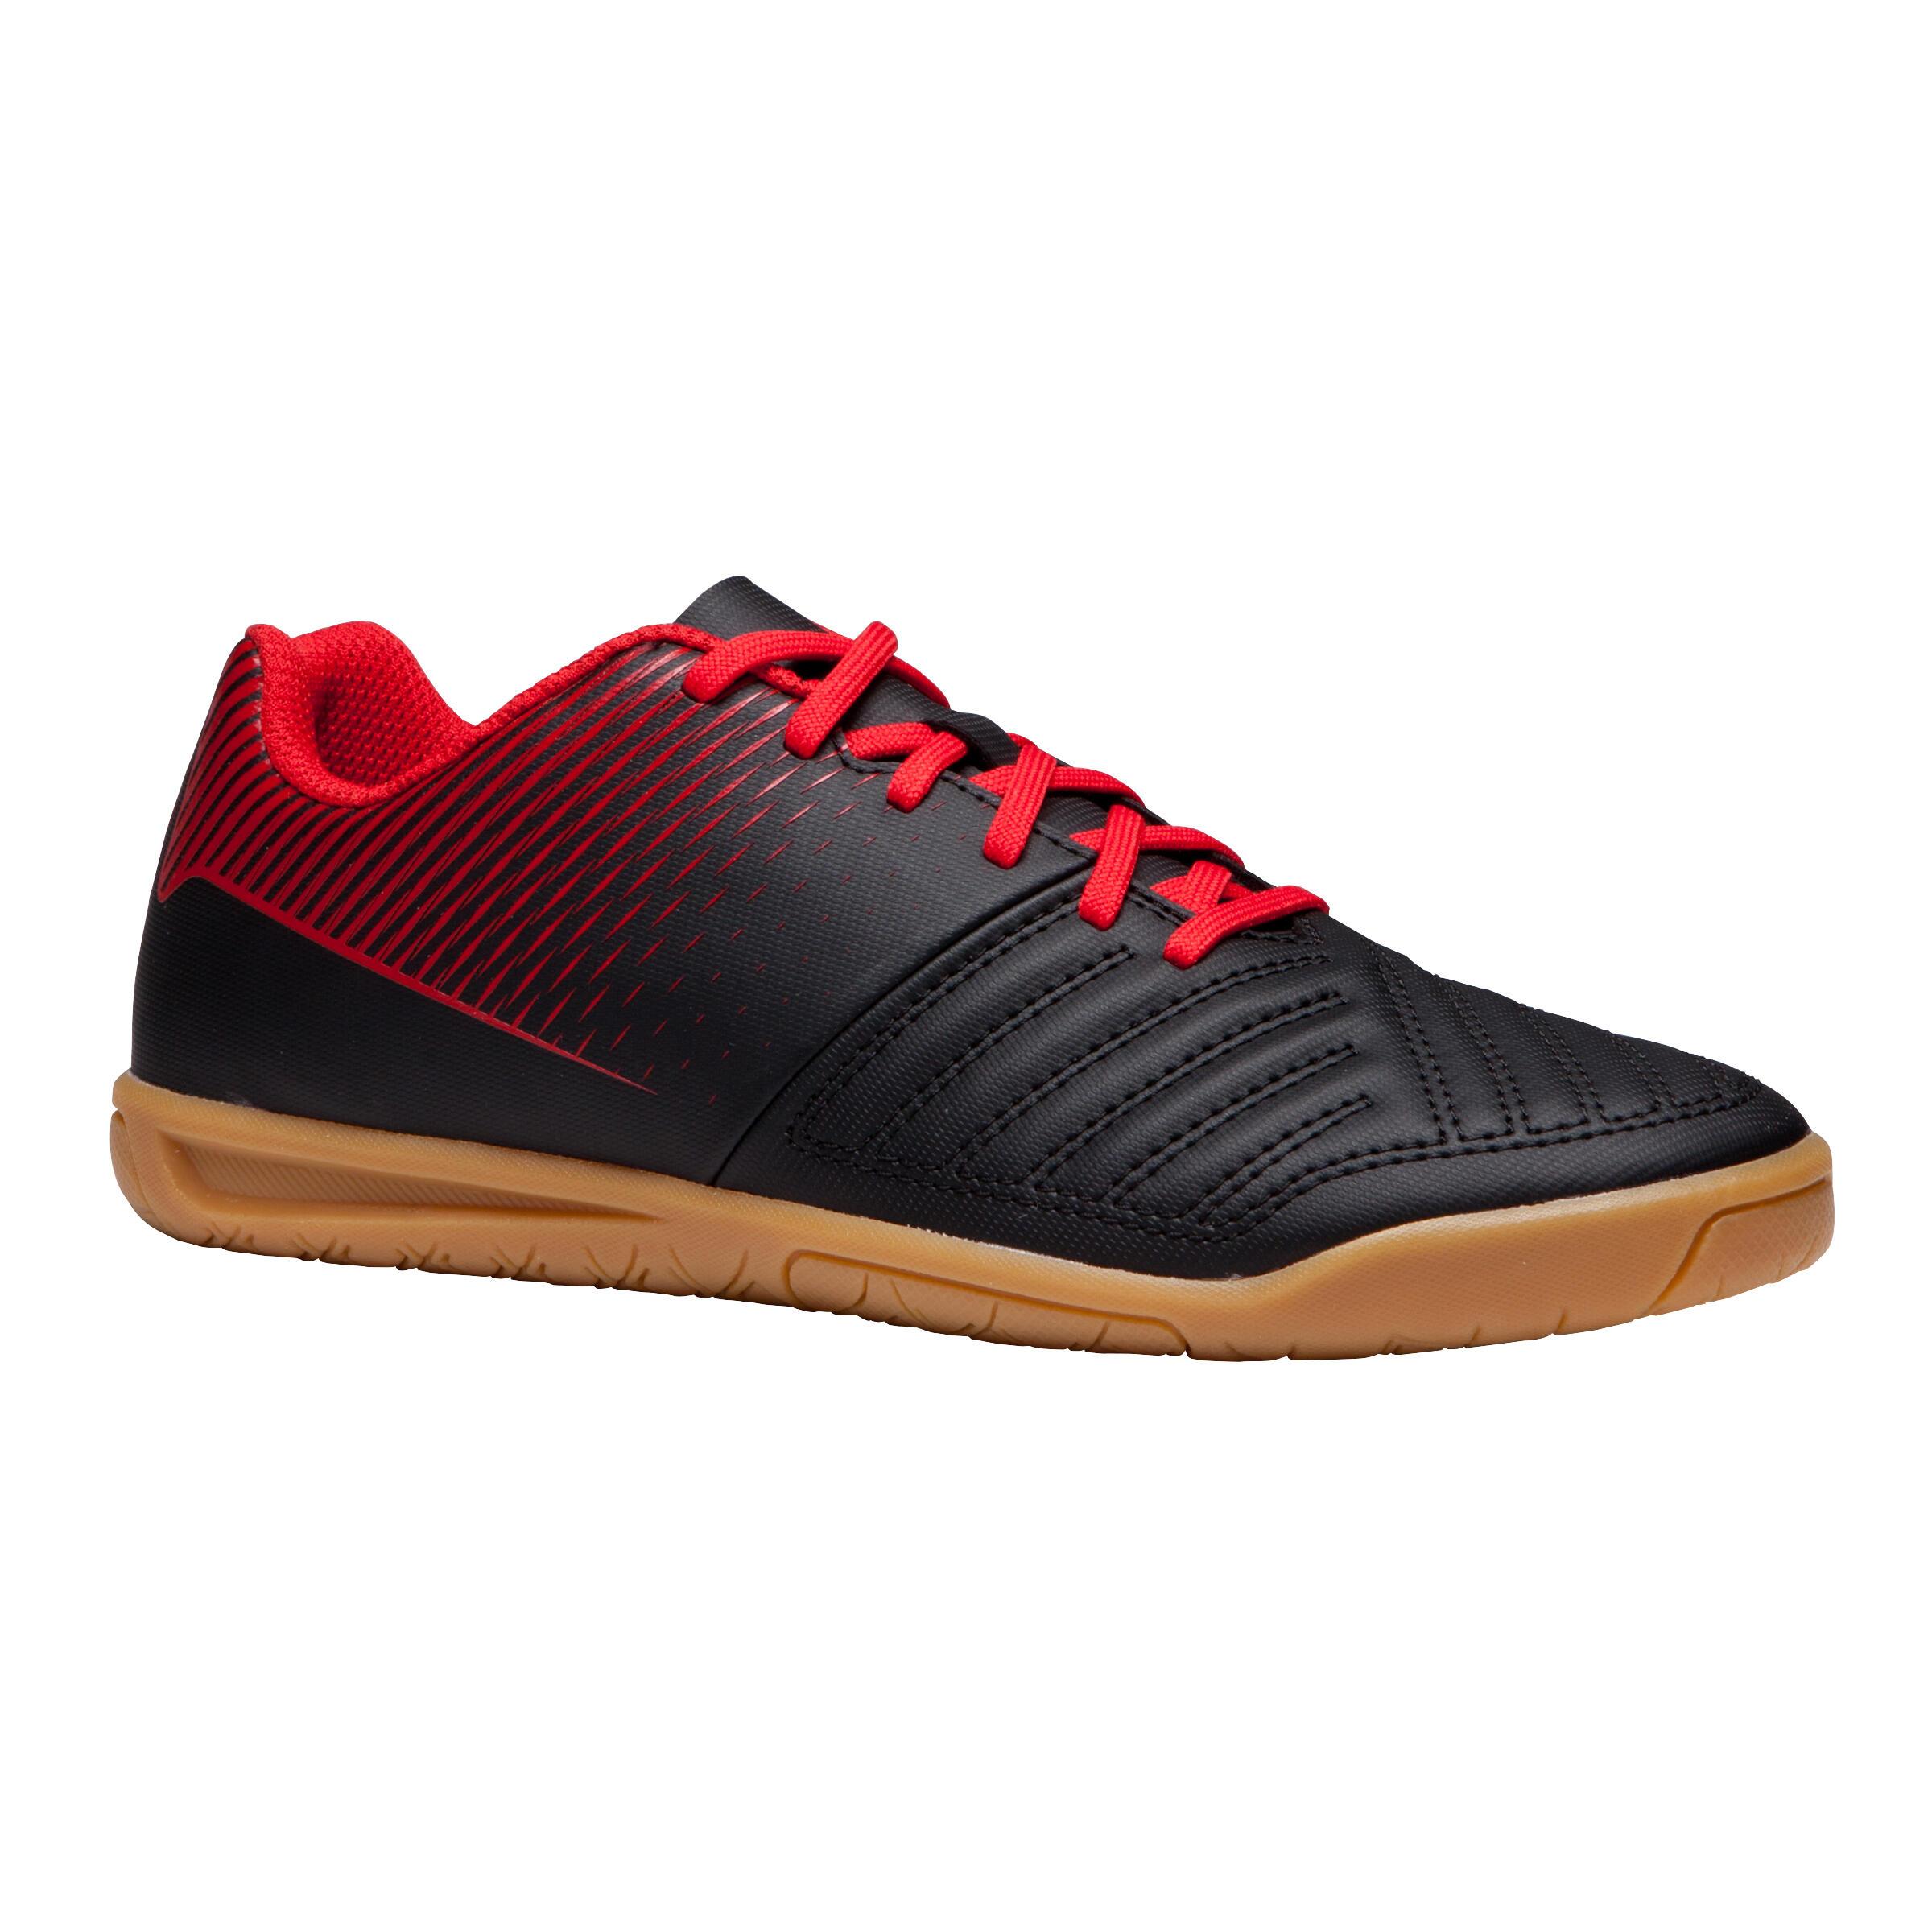 Chaussures de futsal enfant Agility 100 noire IMVISO   Decathlon